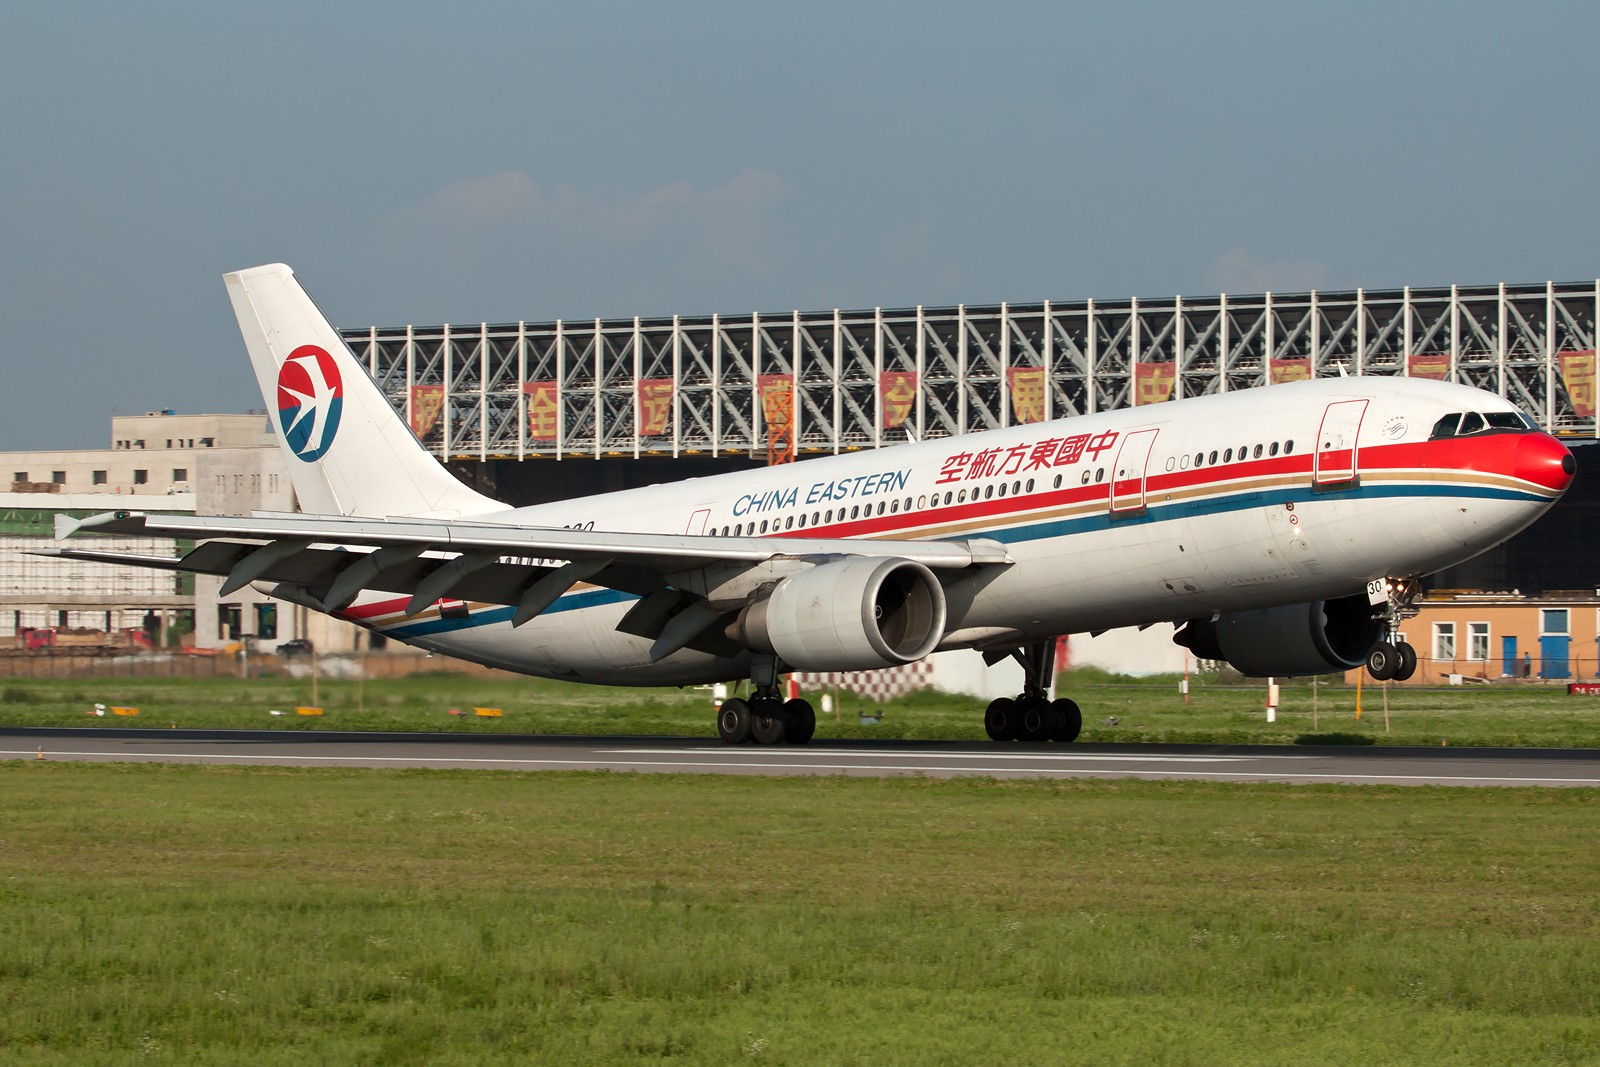 Re:[原创]SHE一组 AIRBUS A300B4-600 B-2330 中国沈阳桃仙国际机场